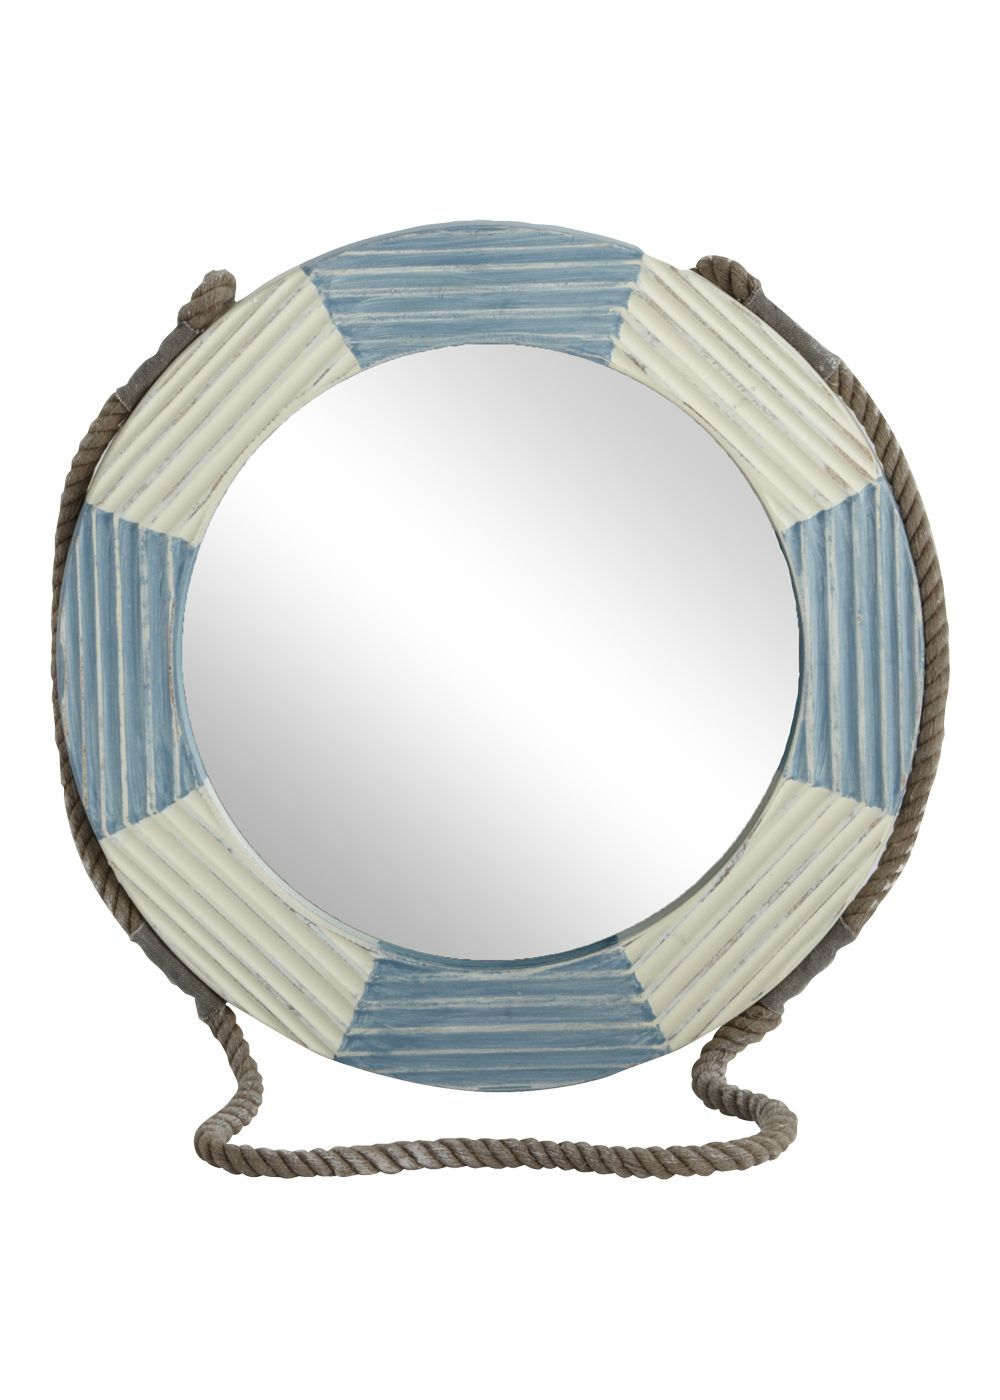 inspire me cottage circular mirror mirror nautical. Black Bedroom Furniture Sets. Home Design Ideas